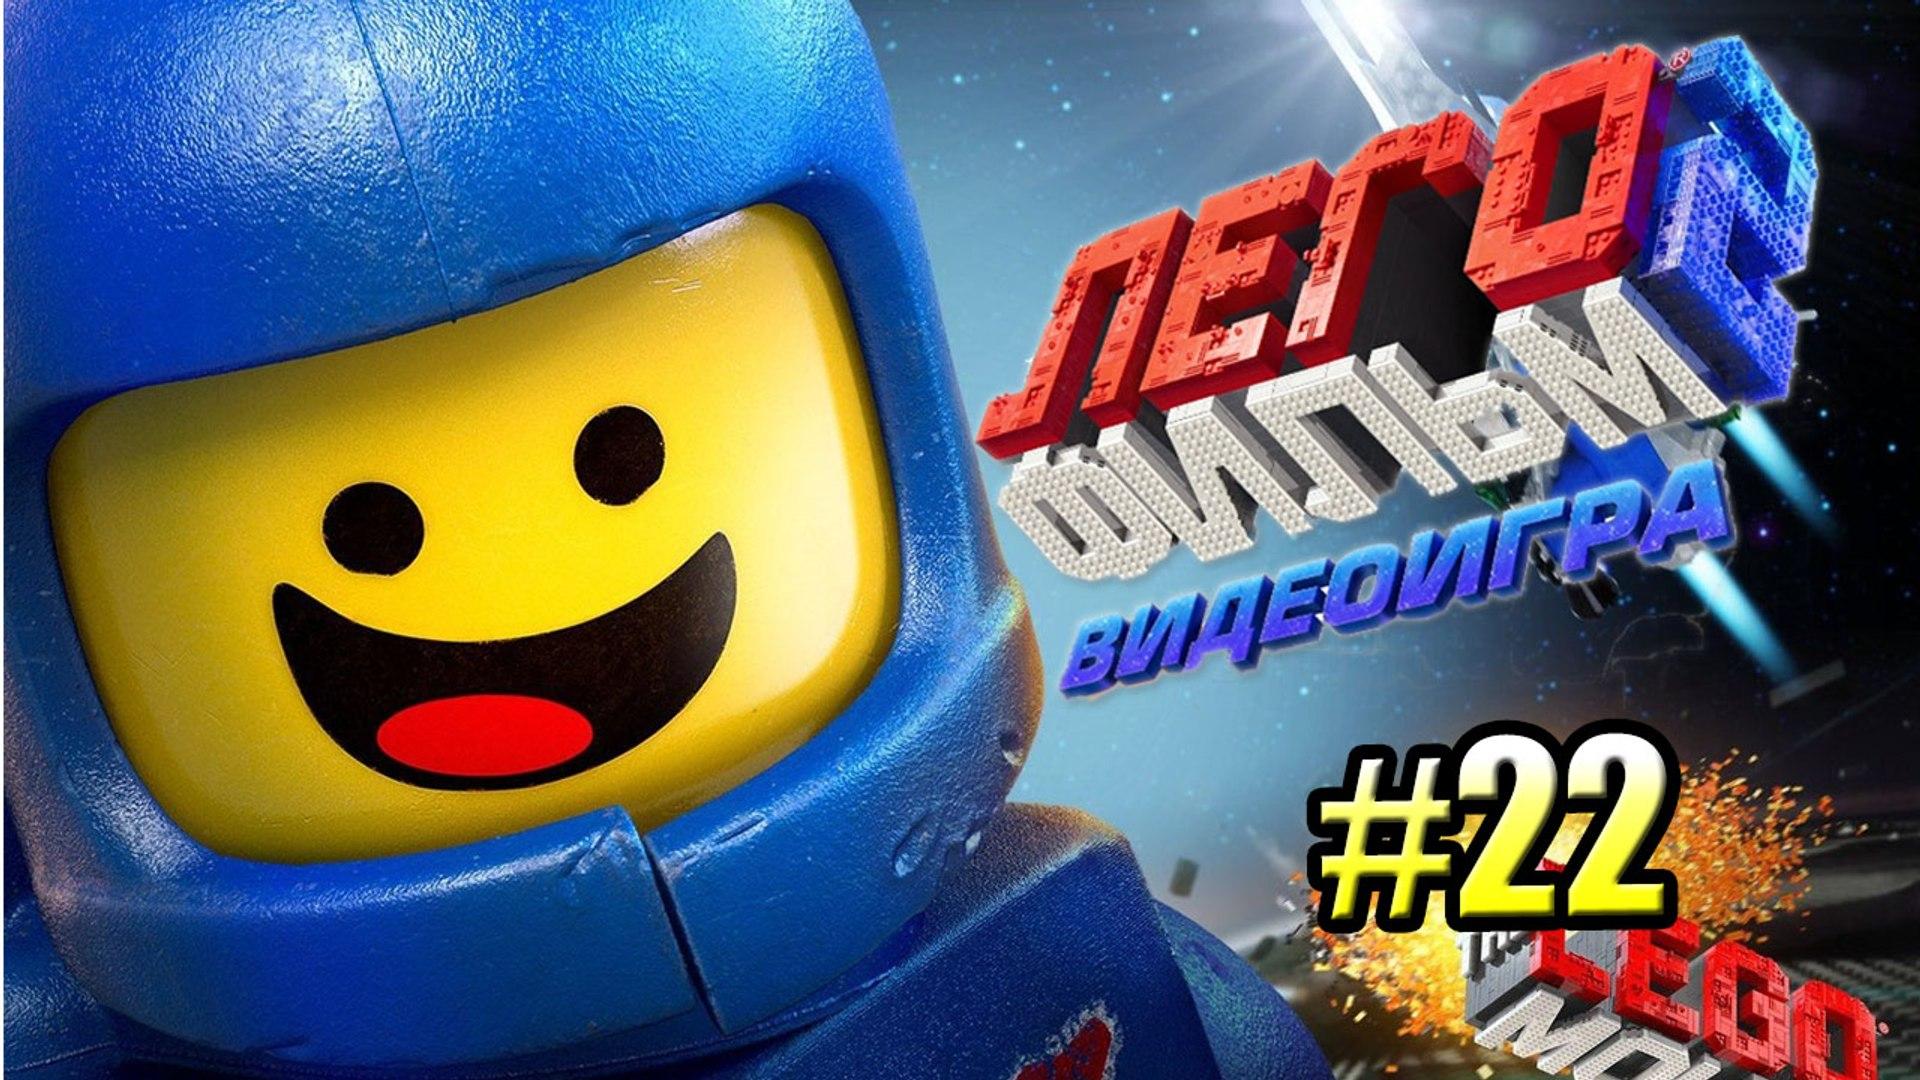 The LEGO Movie 2 Videogame прохождение #22 на русском {PC} Классический Кирпич-град на 100%